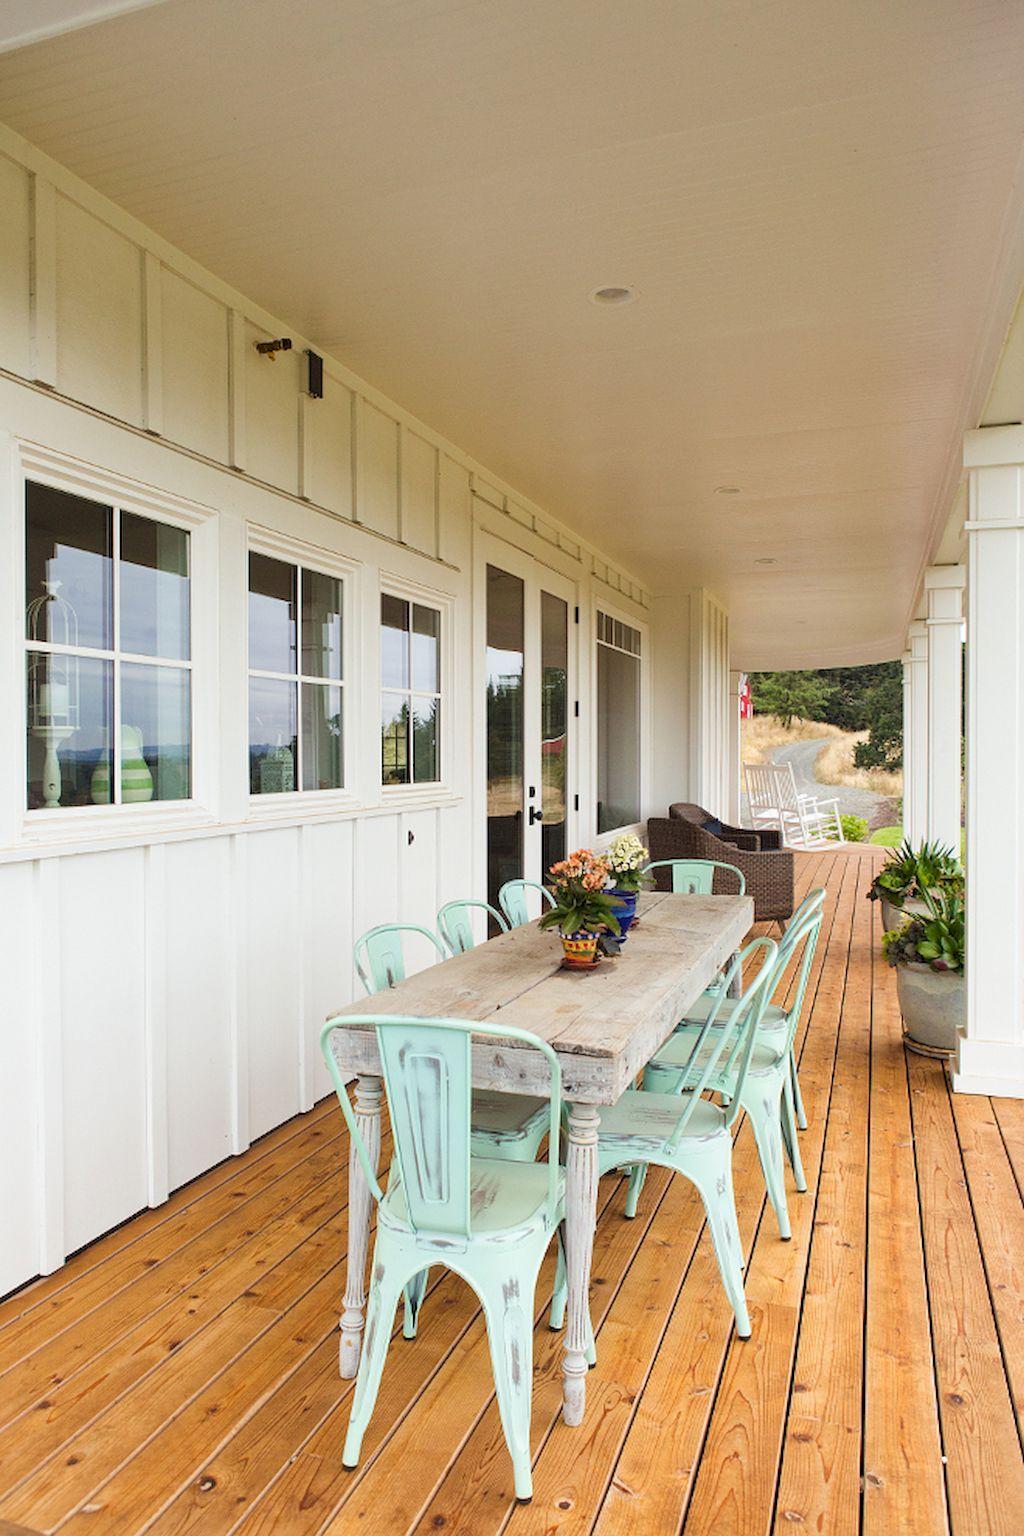 60 Rustic Farmhouse Porch Decor Ideas #rusticporchideas